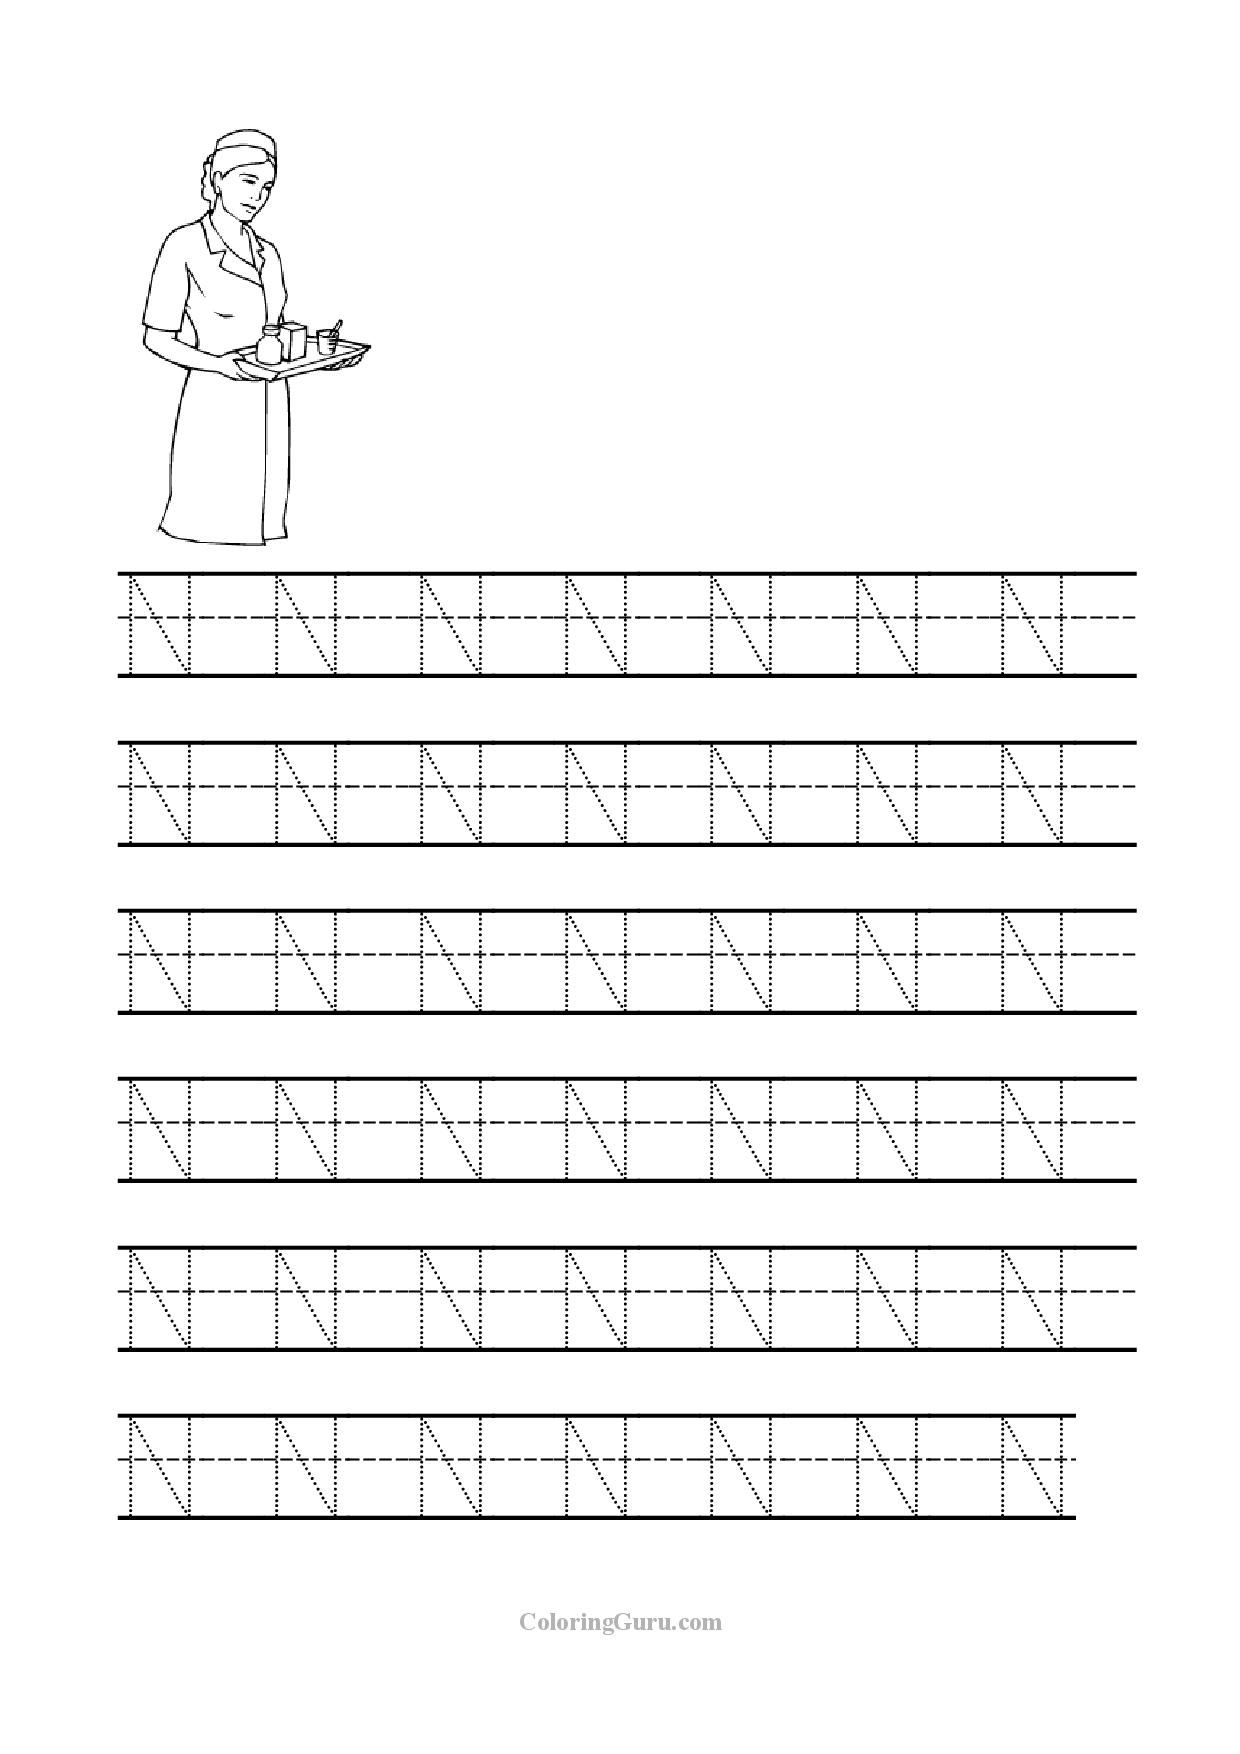 Free Printable Tracing Letter N Worksheets For Preschool